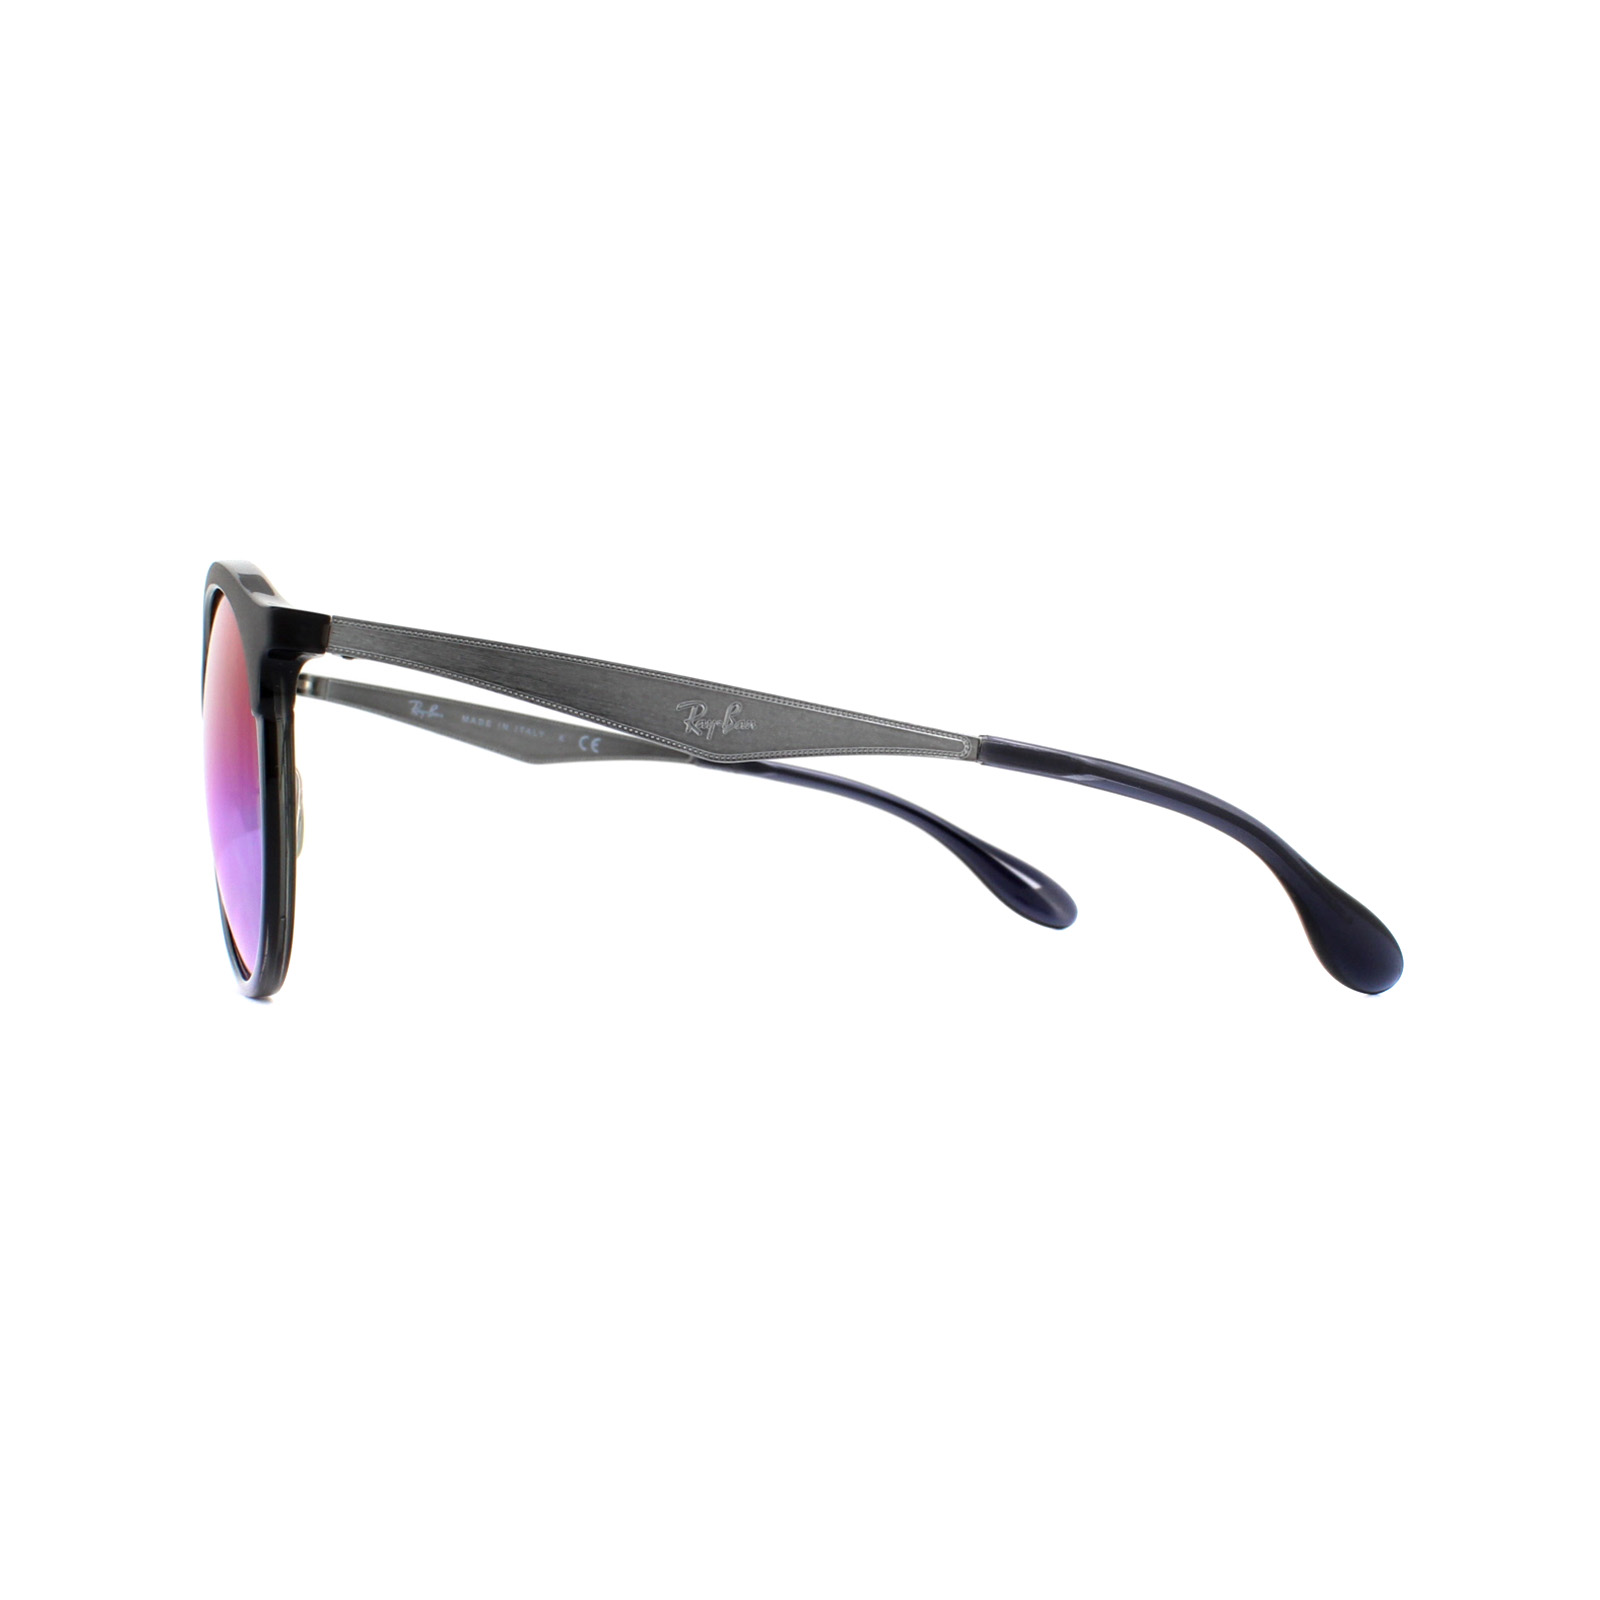 b167750f50 Sentinel Ray-Ban Sunglasses Emma RB4277 6324B1 Grey Gunmetal Blue Violet Gradient  Mirror